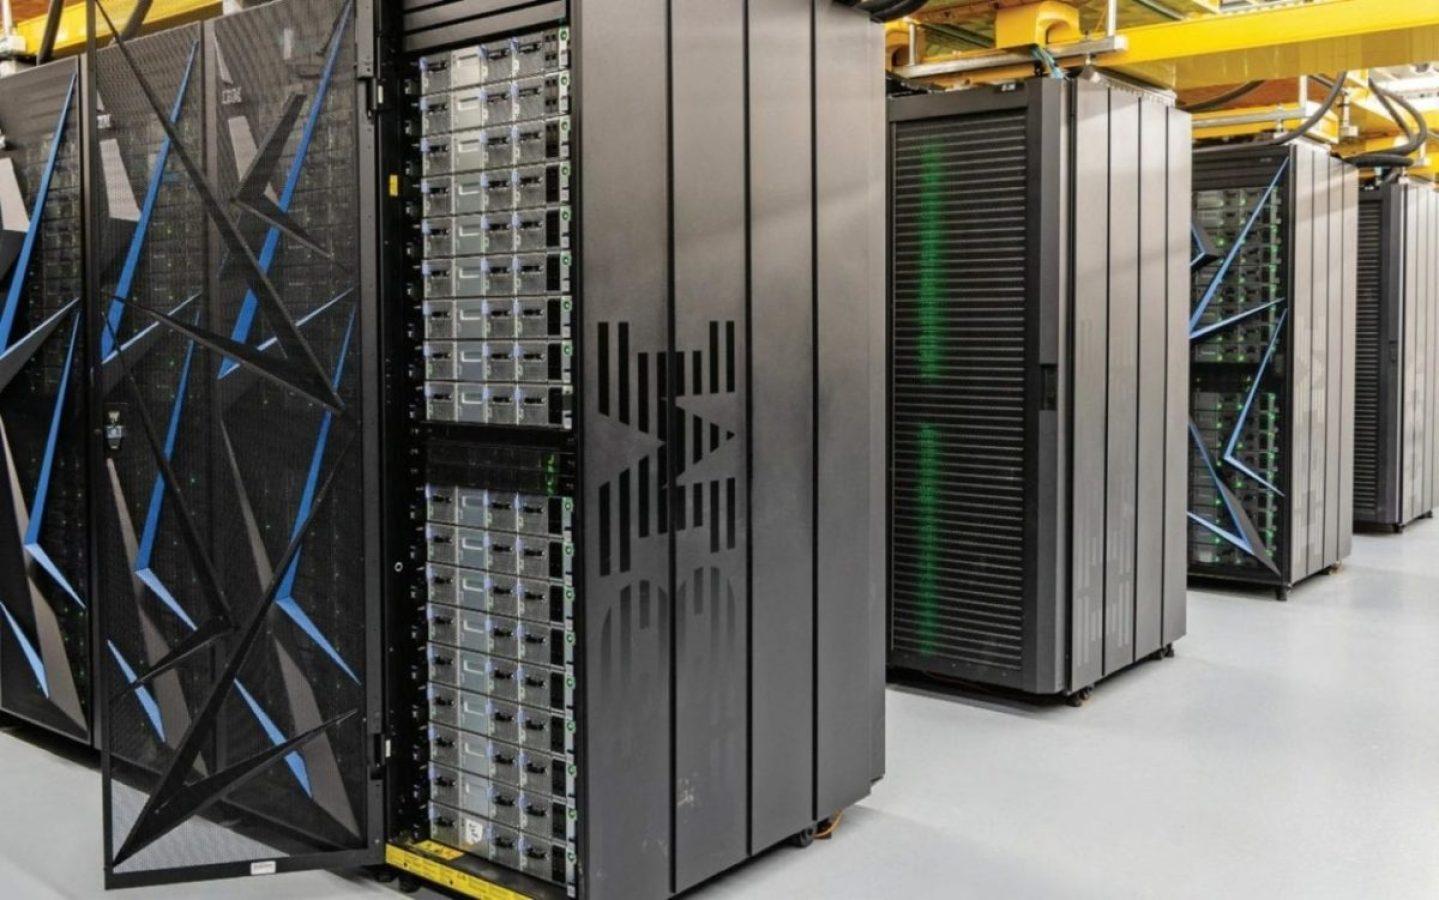 The Summit supercomputer at the Department of Energy's (DOE) Oak Ridge National Laboratory.